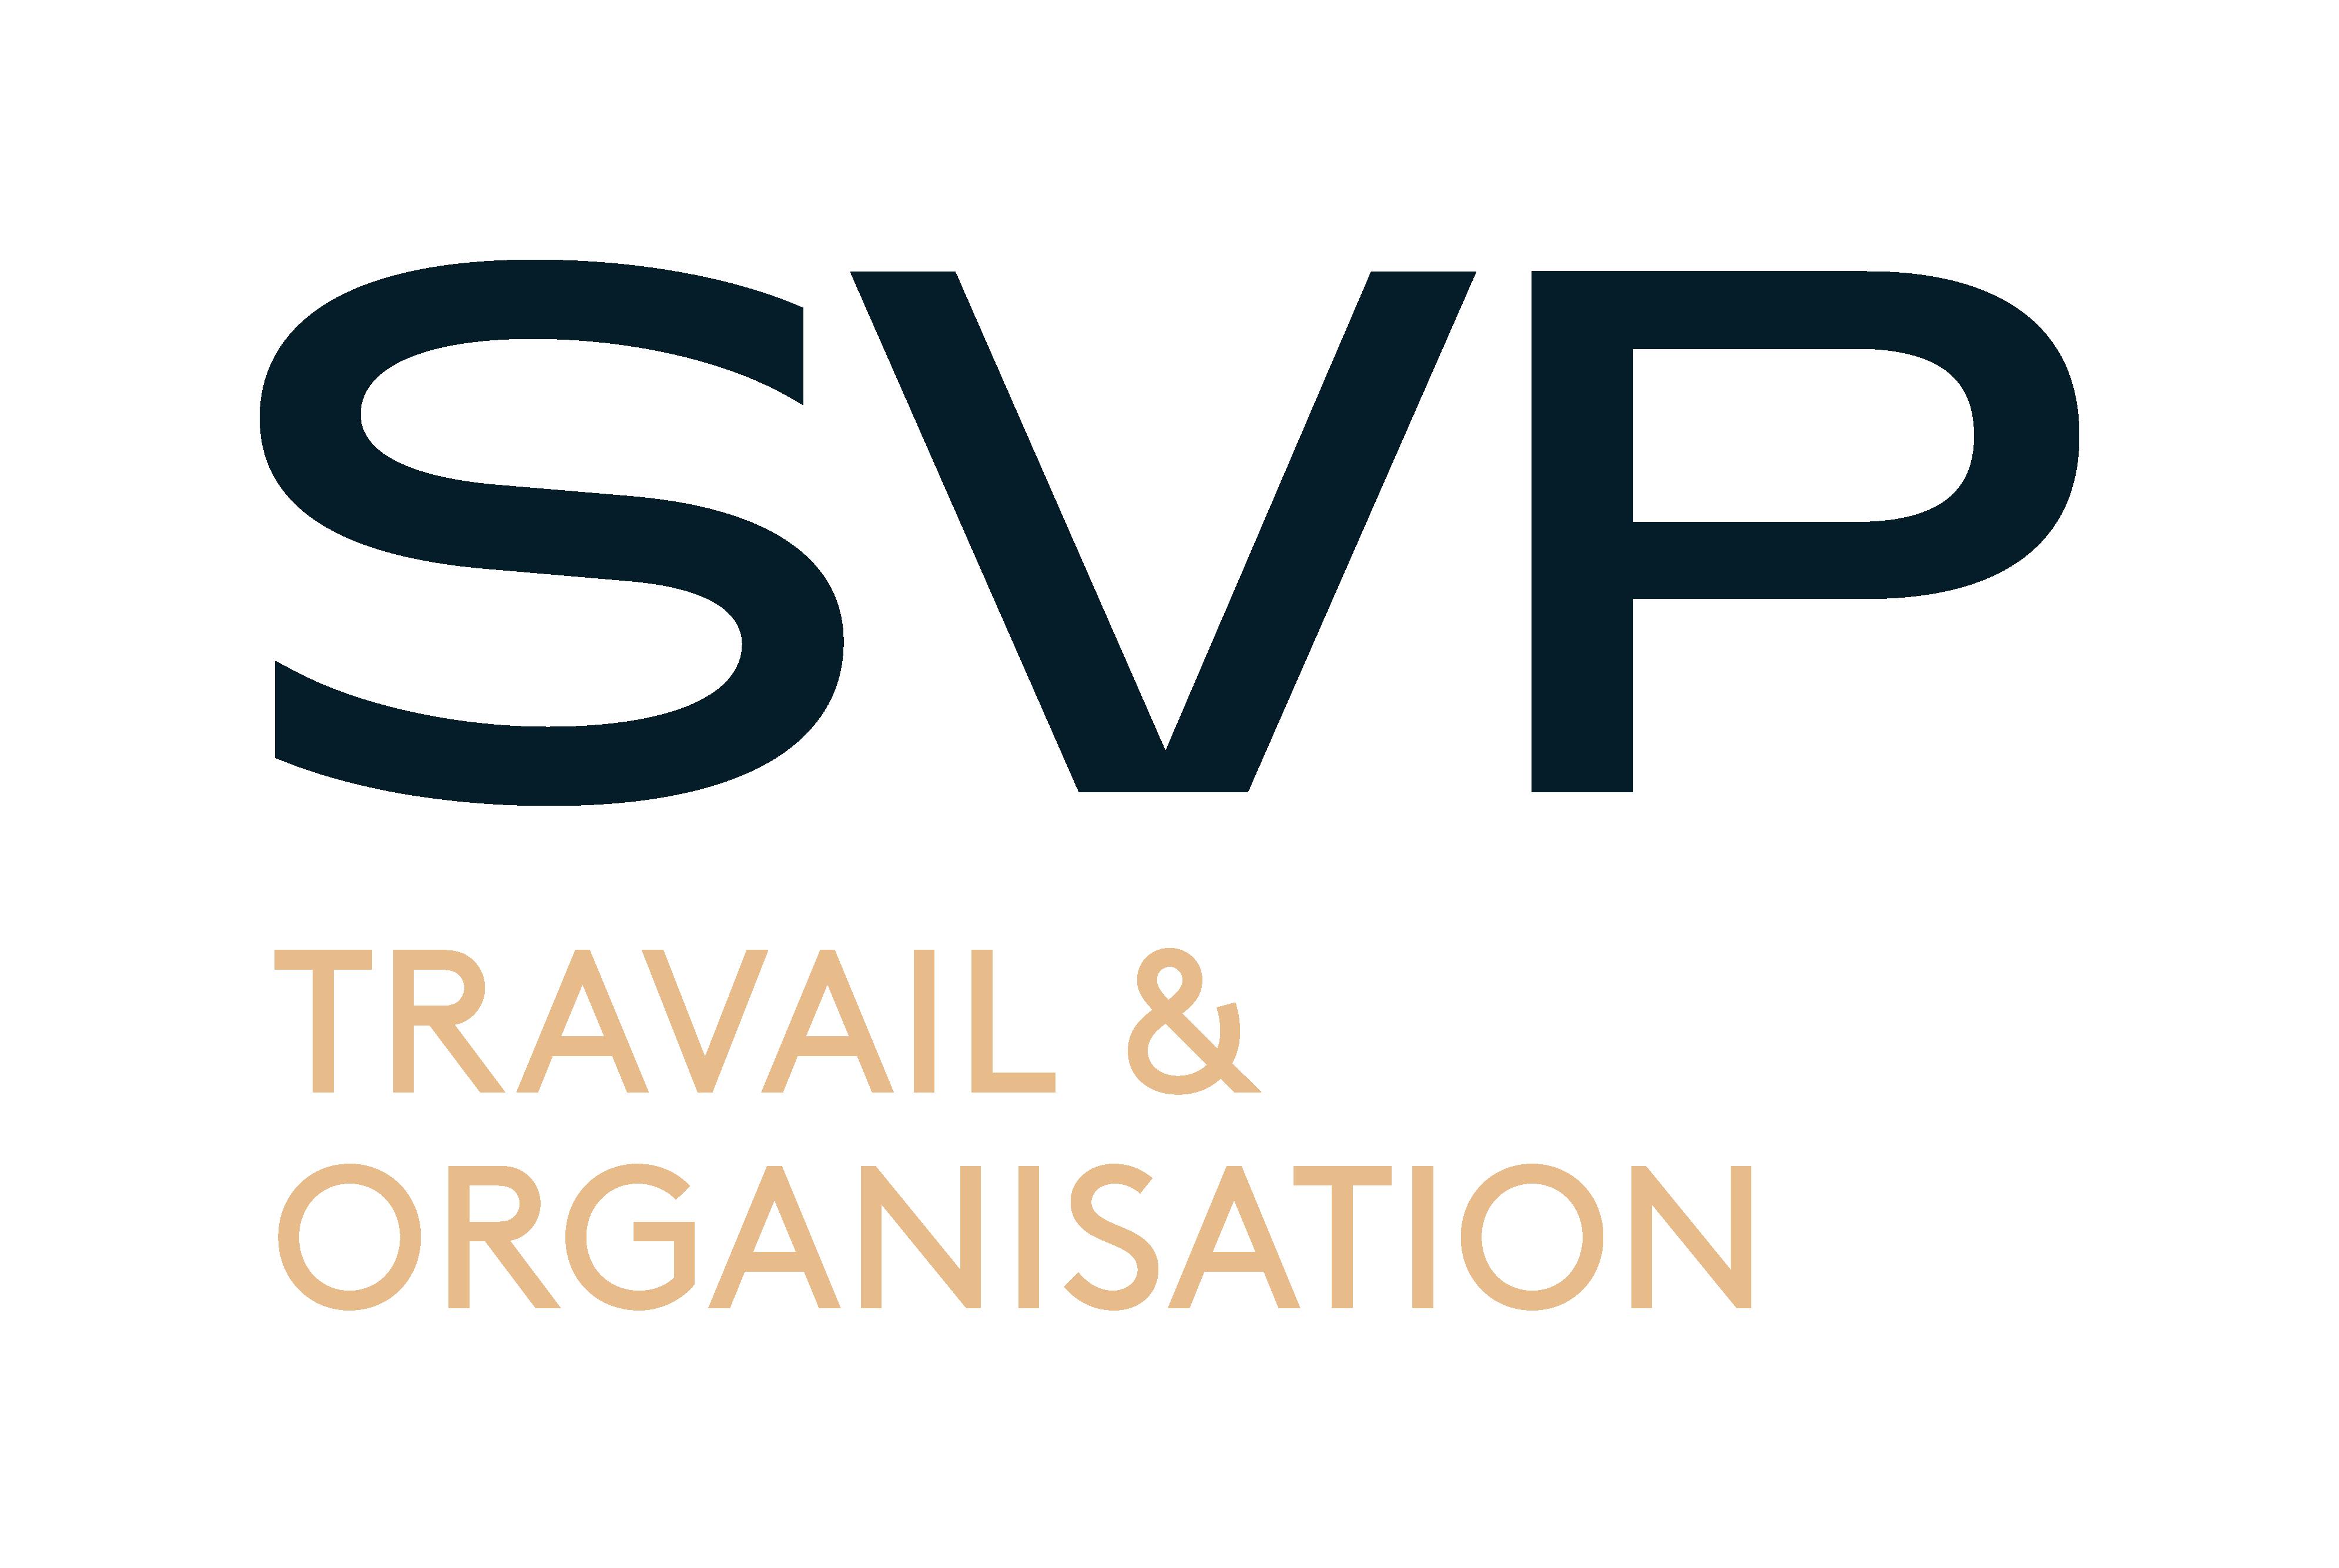 Centre SVP Travail & Organisation  - St Avertin (37)